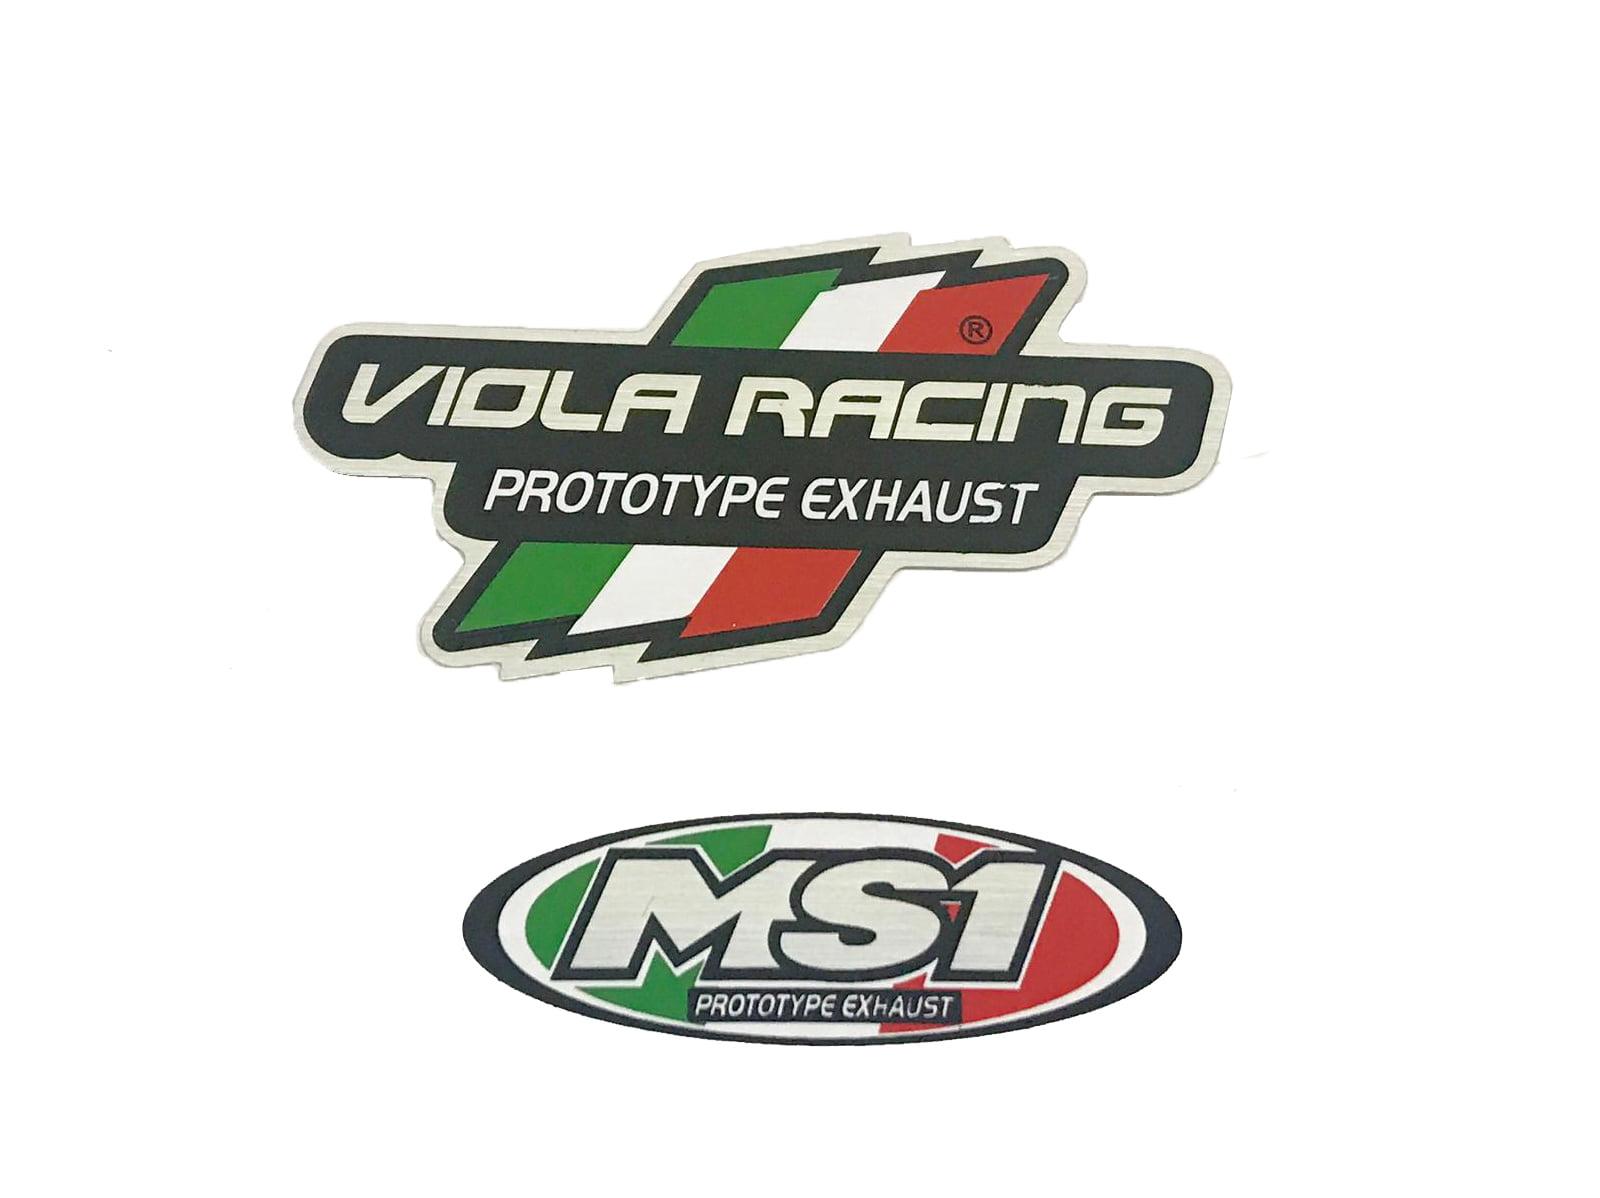 ADESIVO ORIGINAL MS1 VIOLA RACING